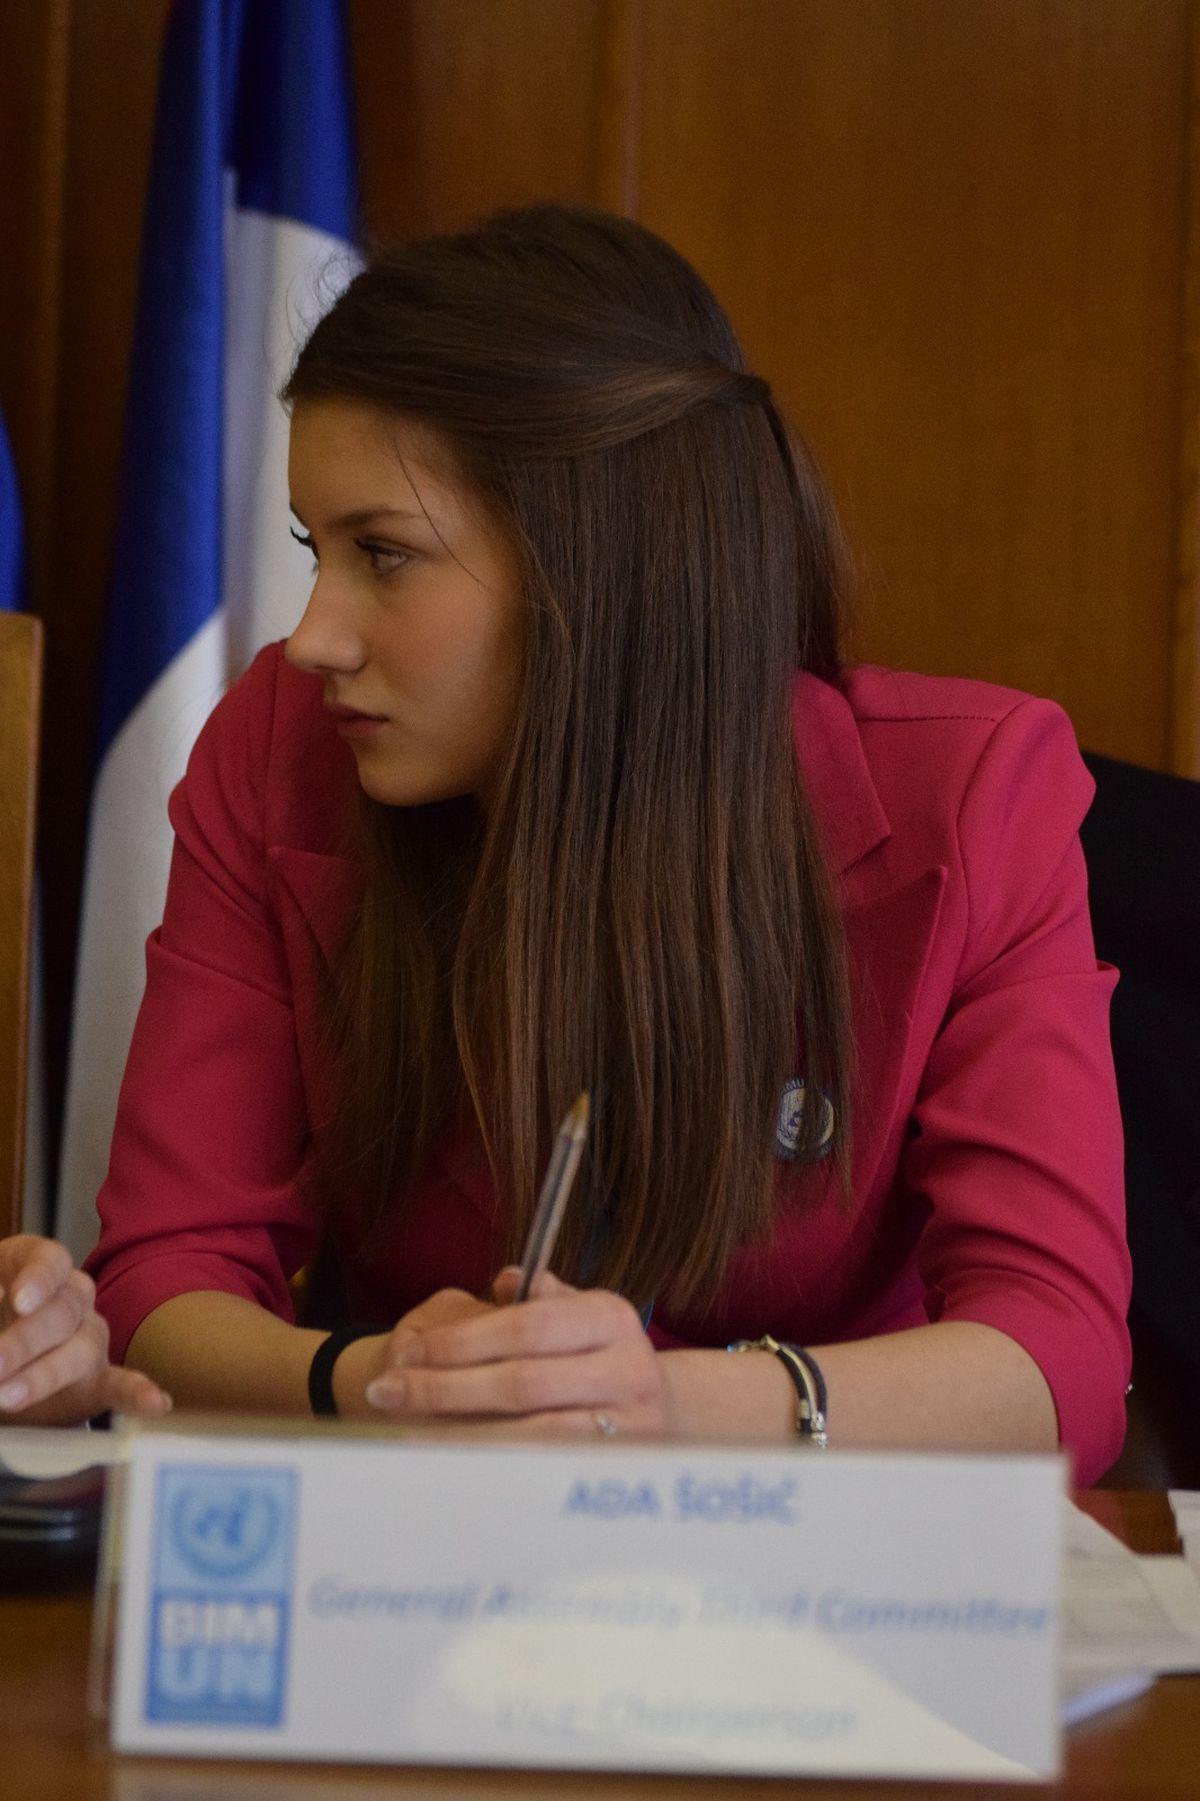 Ada Sosic, 17